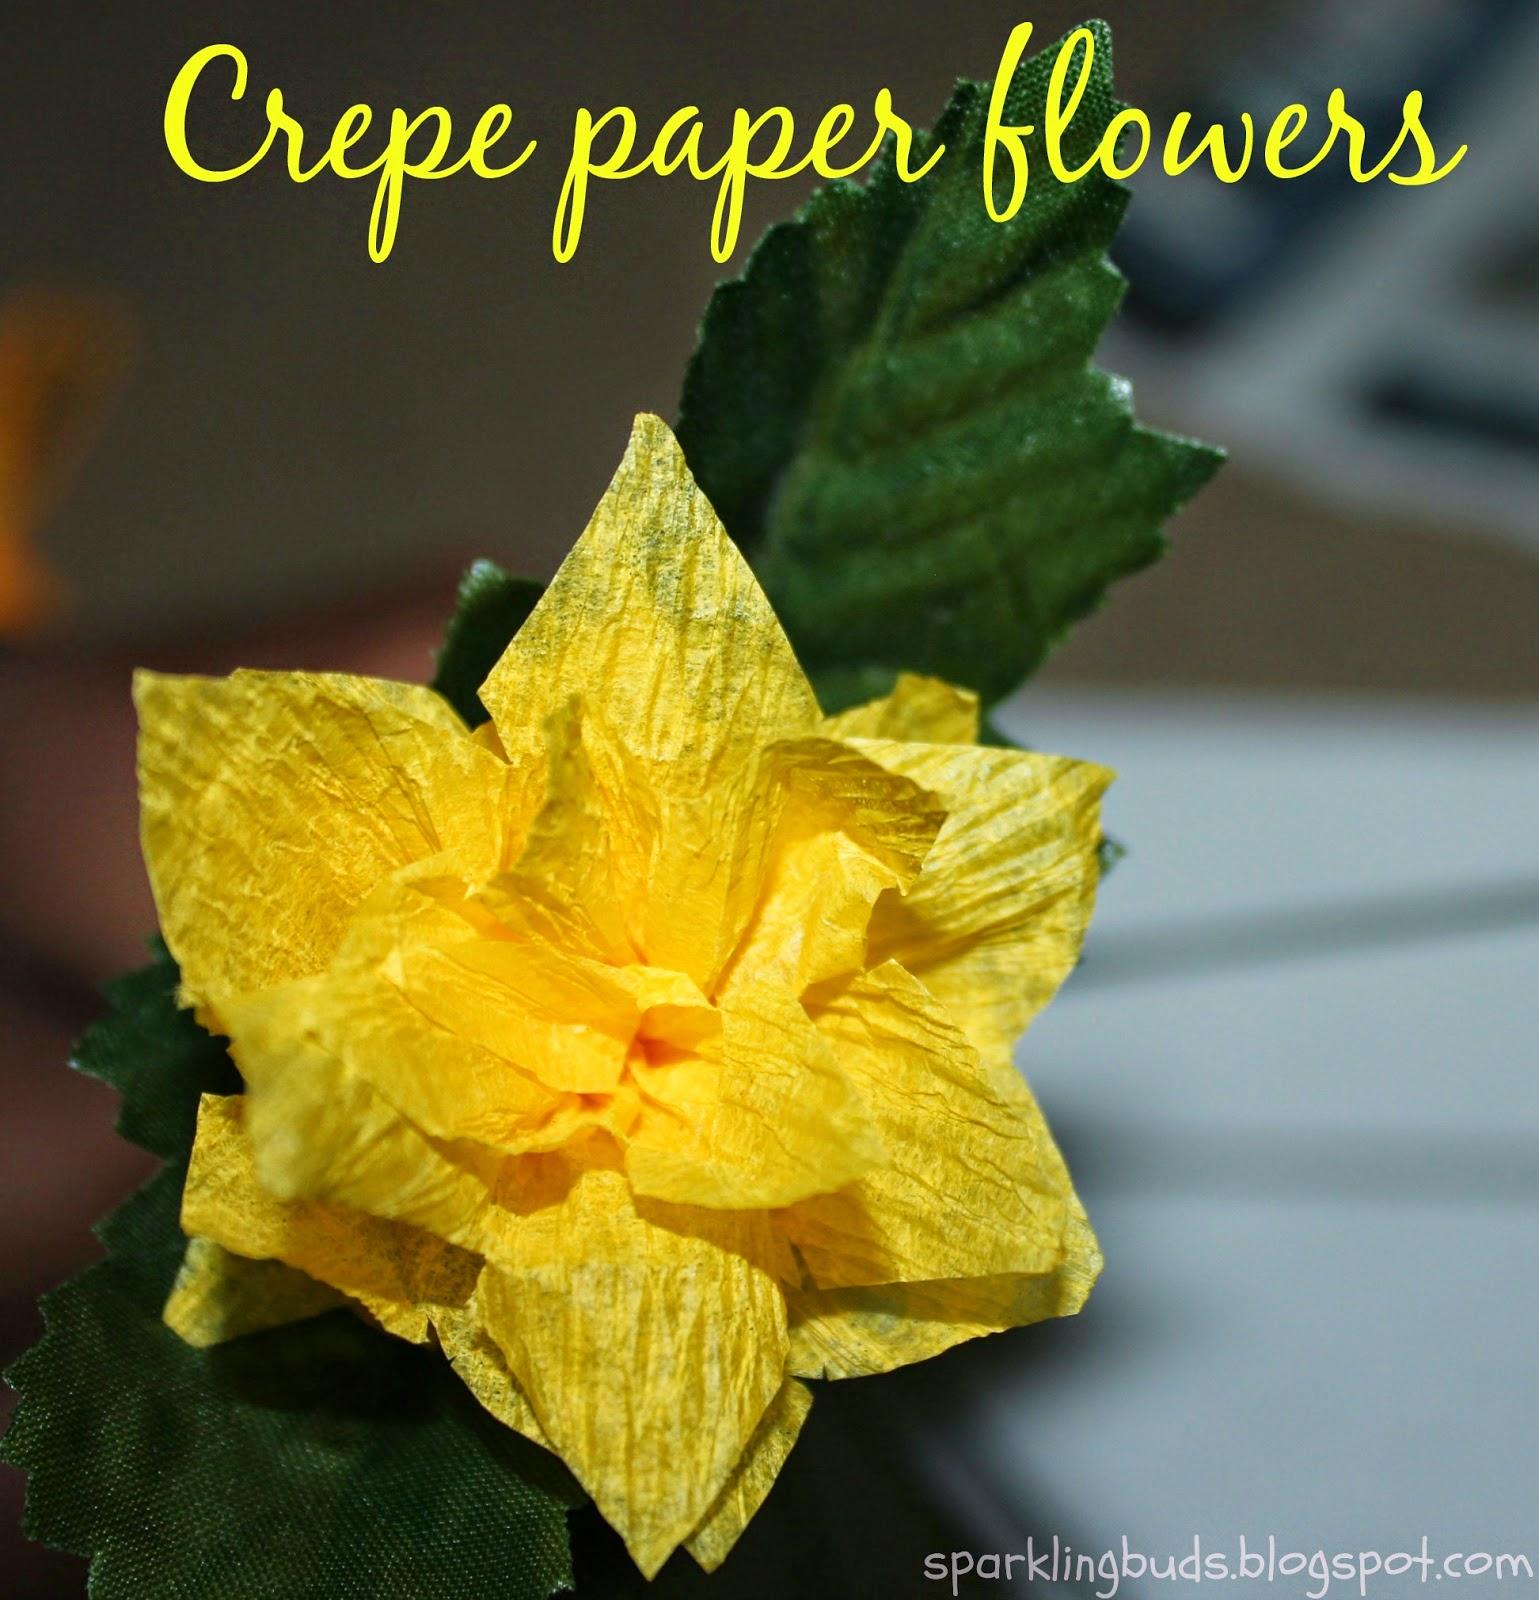 Crepe Paper Flowers Sparklingbuds